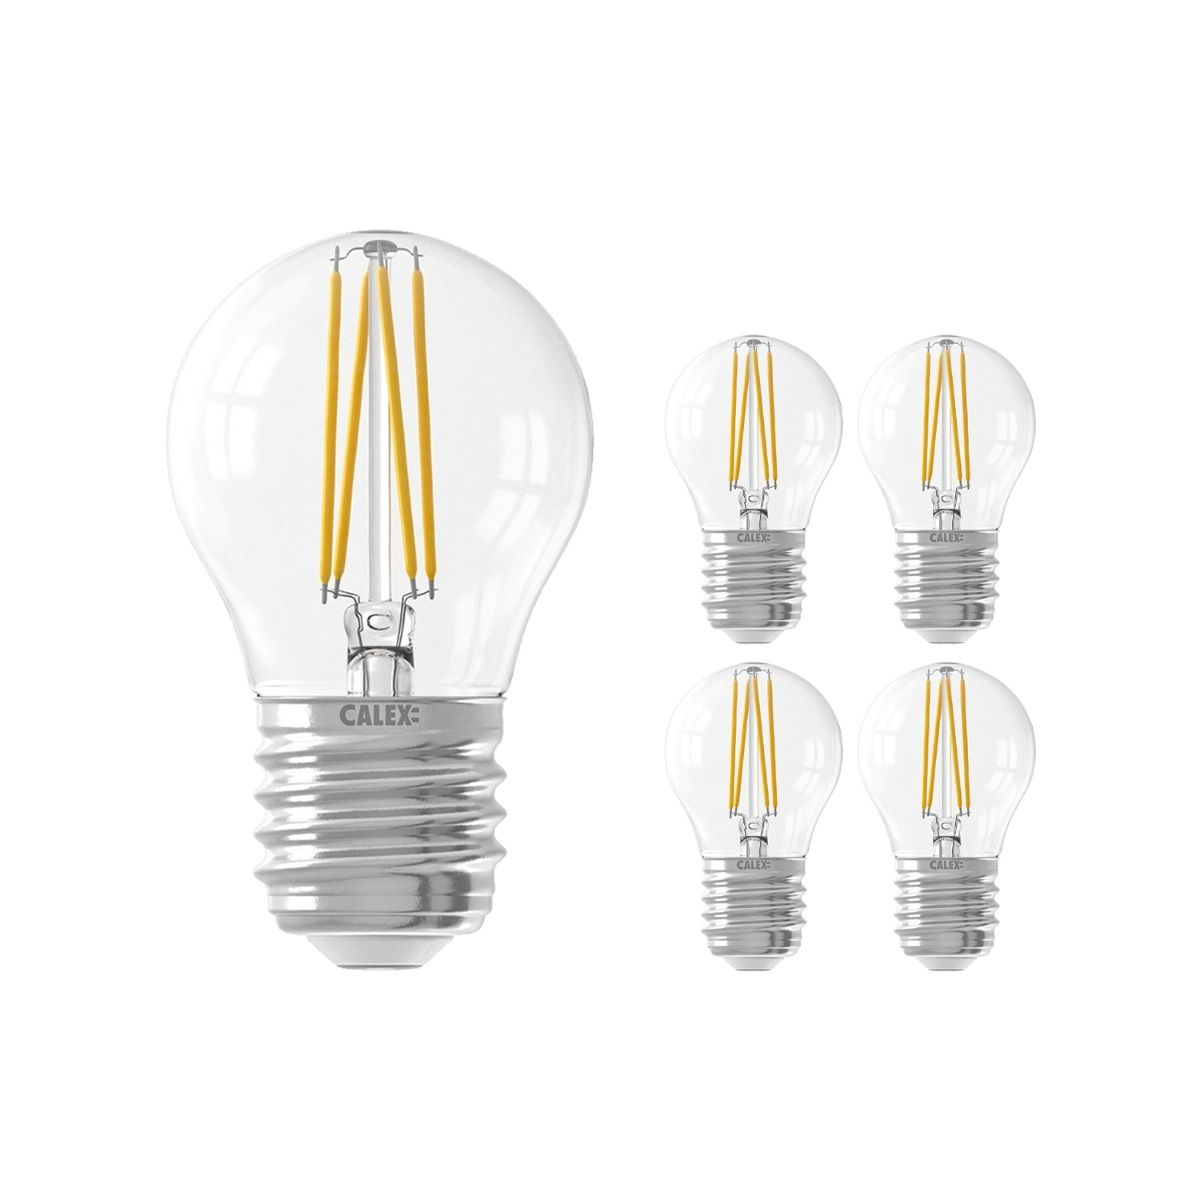 Multipack 5x Calex Smart Spherical LED Bulb E27 4,5W 450lm 1800-3000K Filament | Tuya Wifi